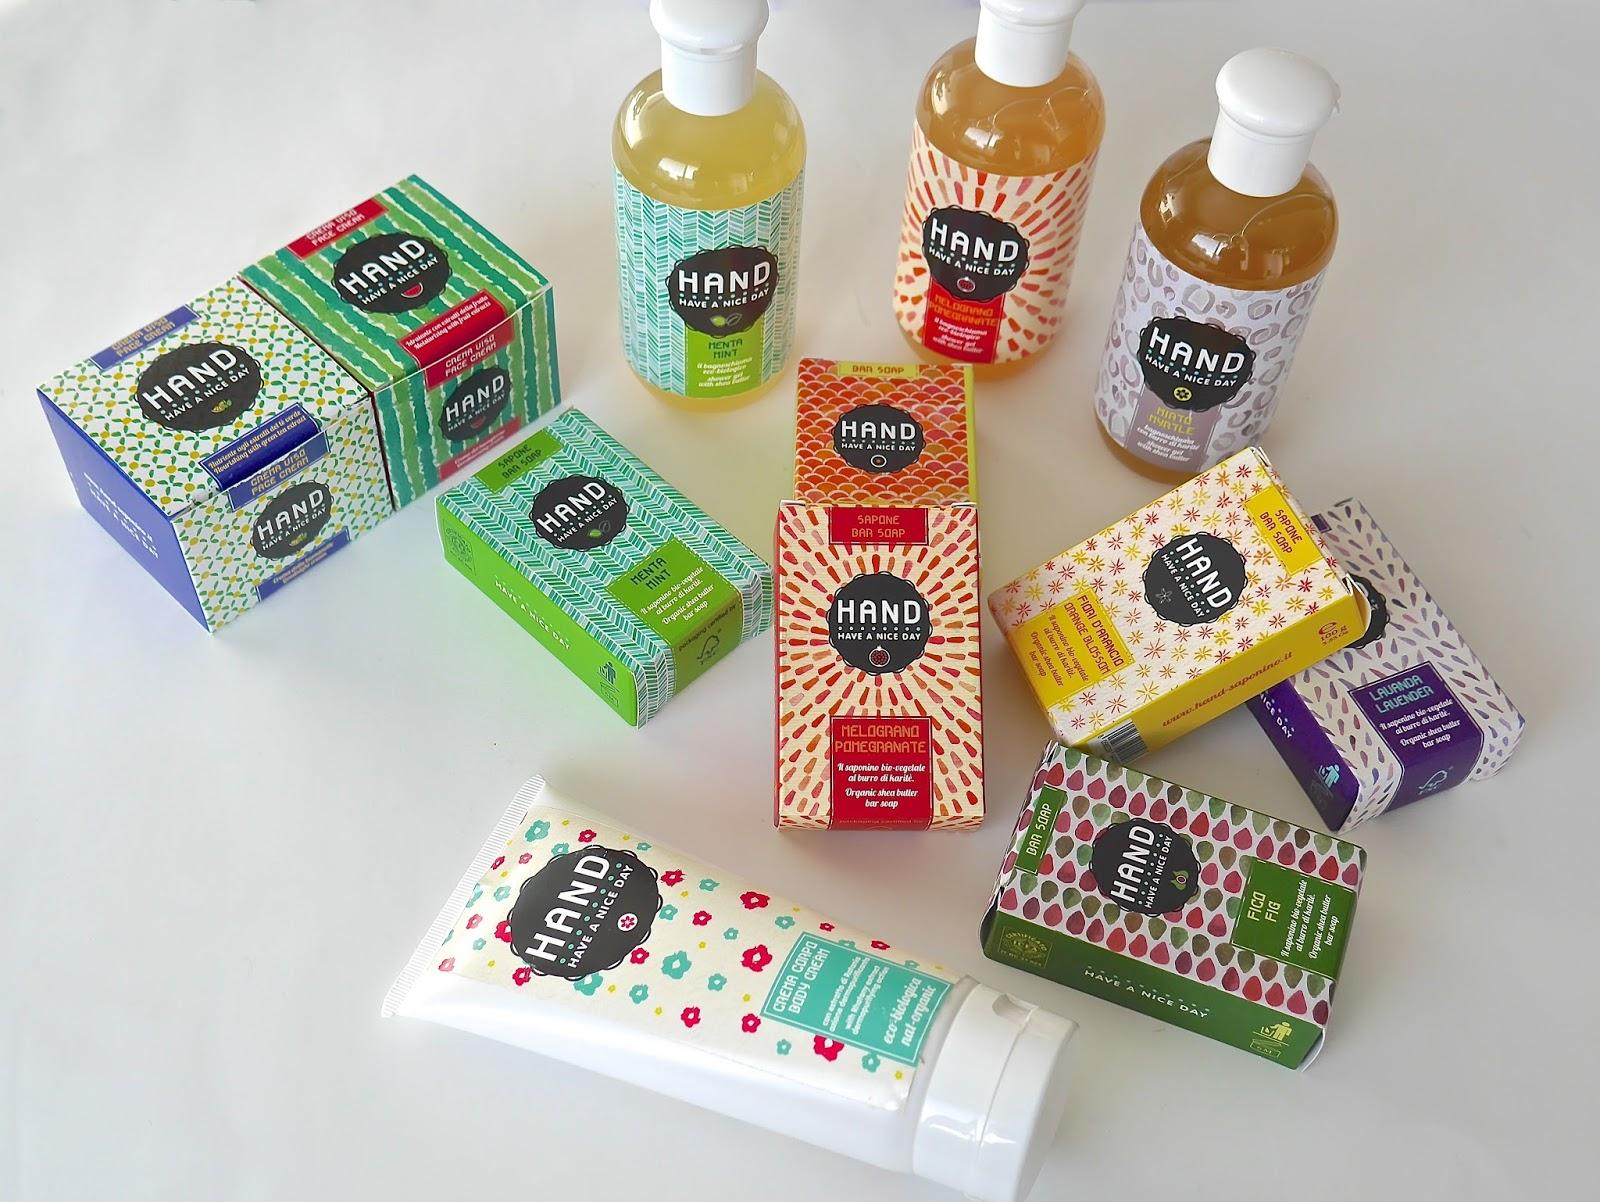 organic, plant based, natural skincare, natural soaps, organic soaps, natural moisturizer, organic moisturizer